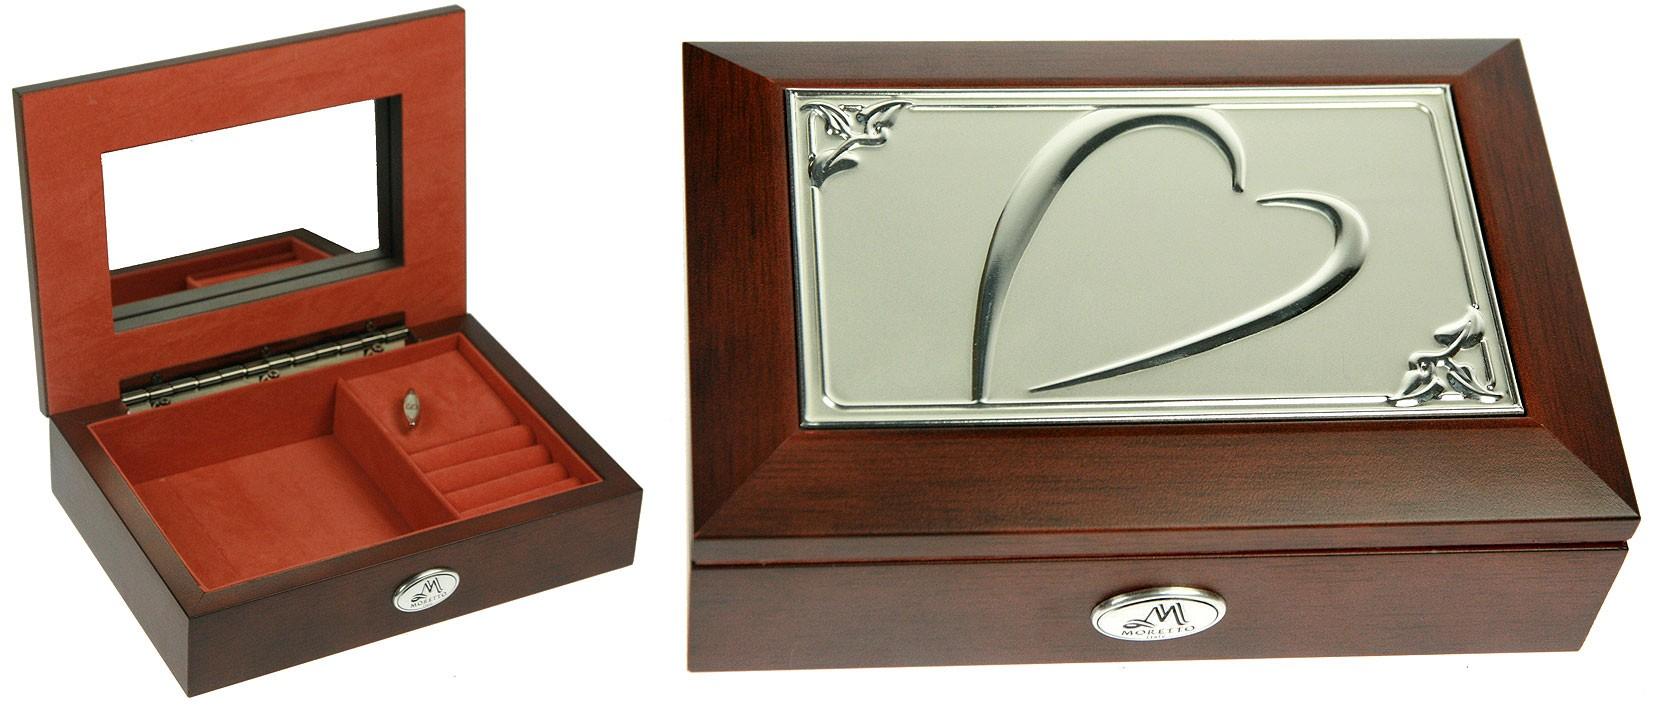 Шкатулка ювелирная MORETTO, музыкальная   Шкатулки для украшений dbf5770cbbc